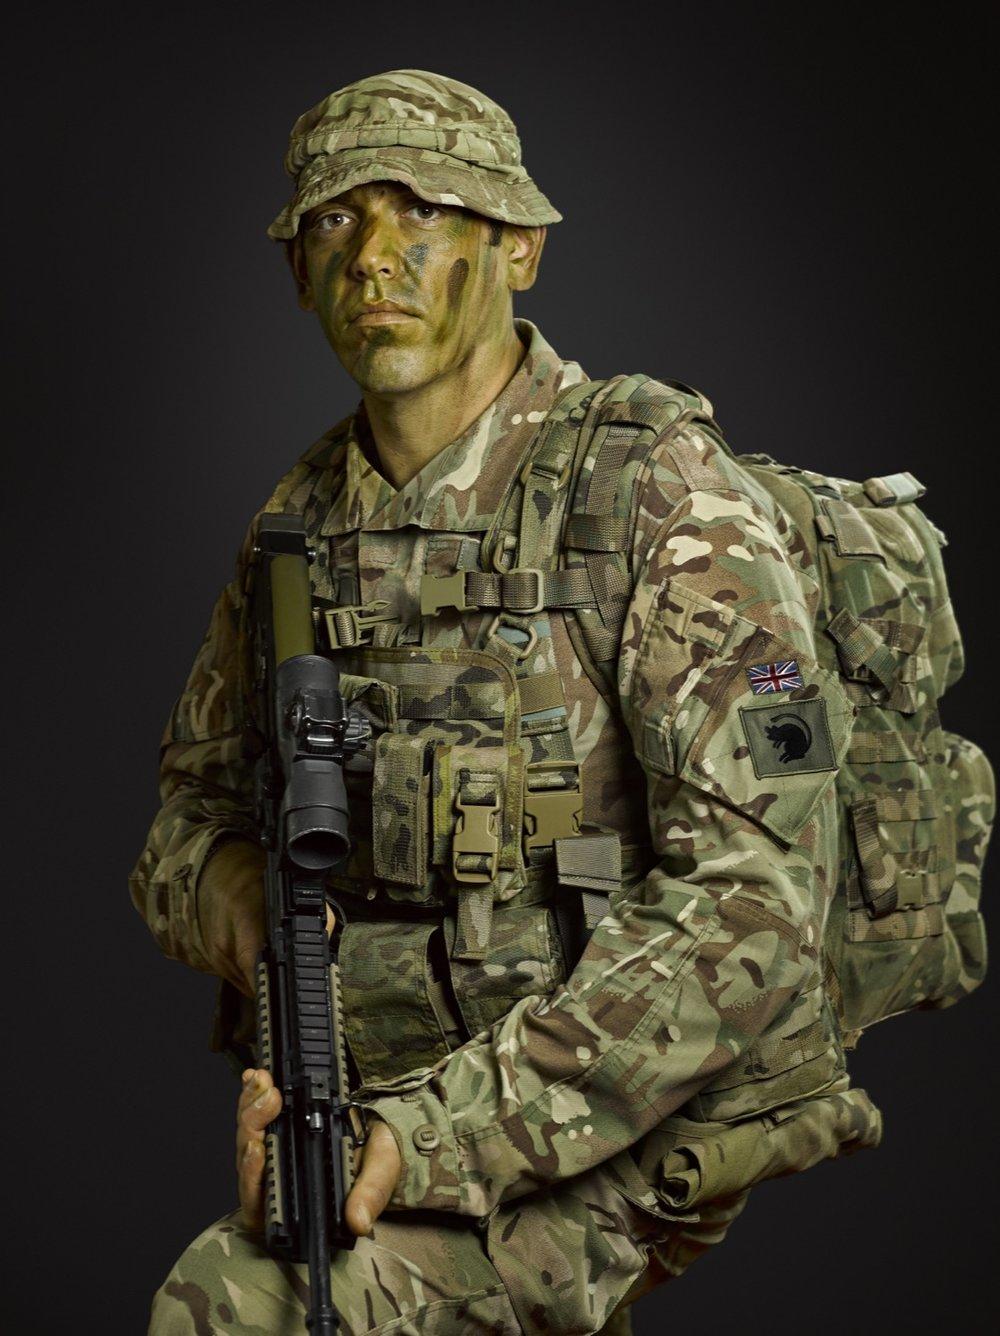 Sergeant Cawthorne (The Light Dragoons) (Rory Lewis London Portrait Photographer)